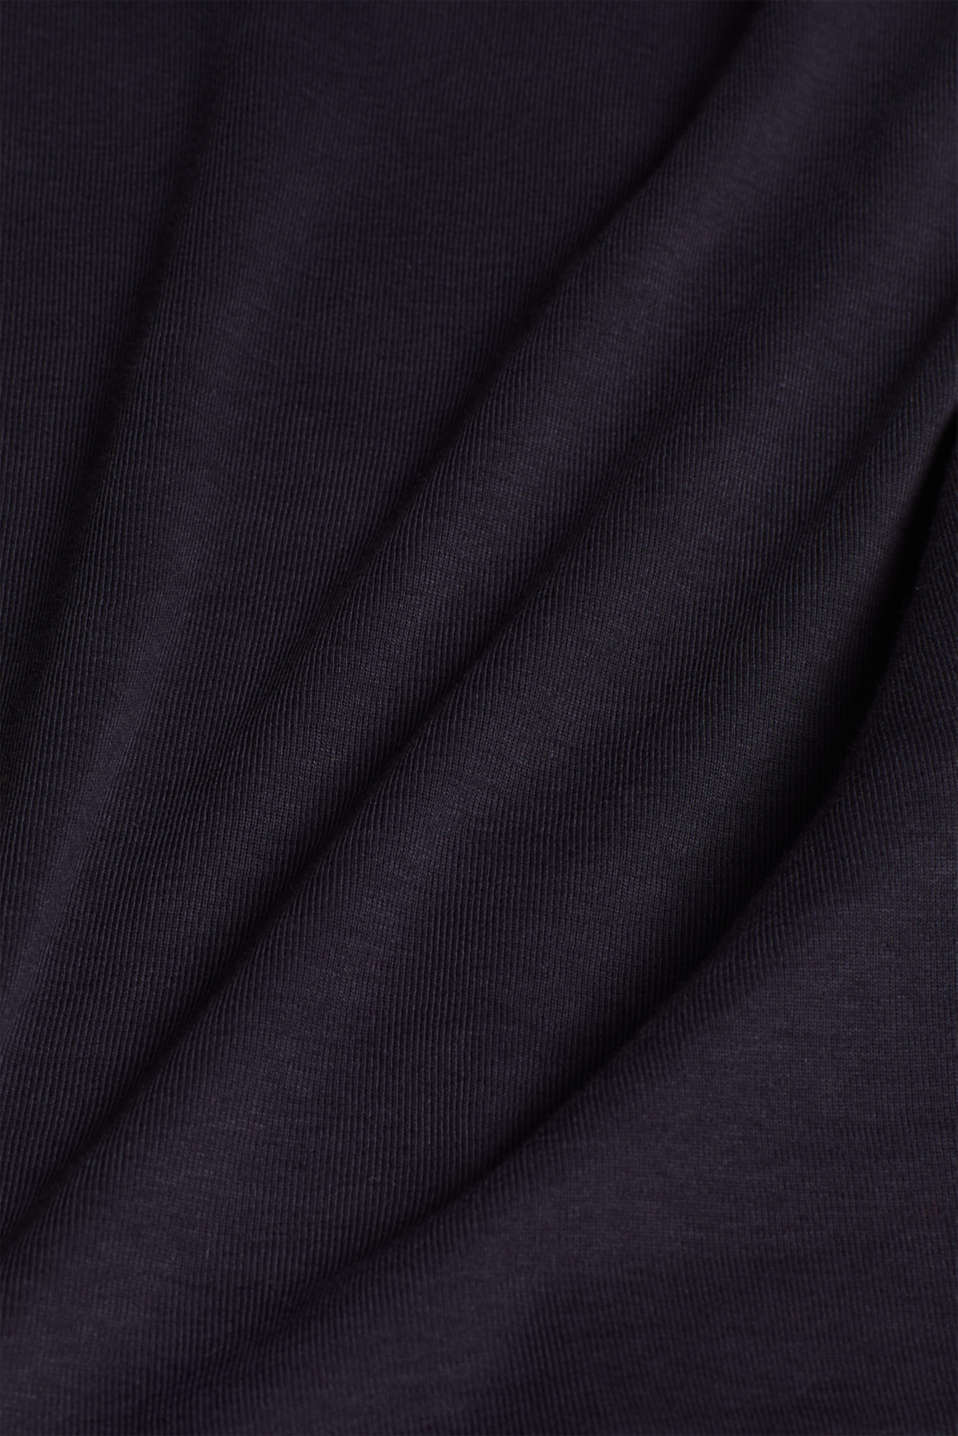 T-Shirts, NAVY, detail image number 2